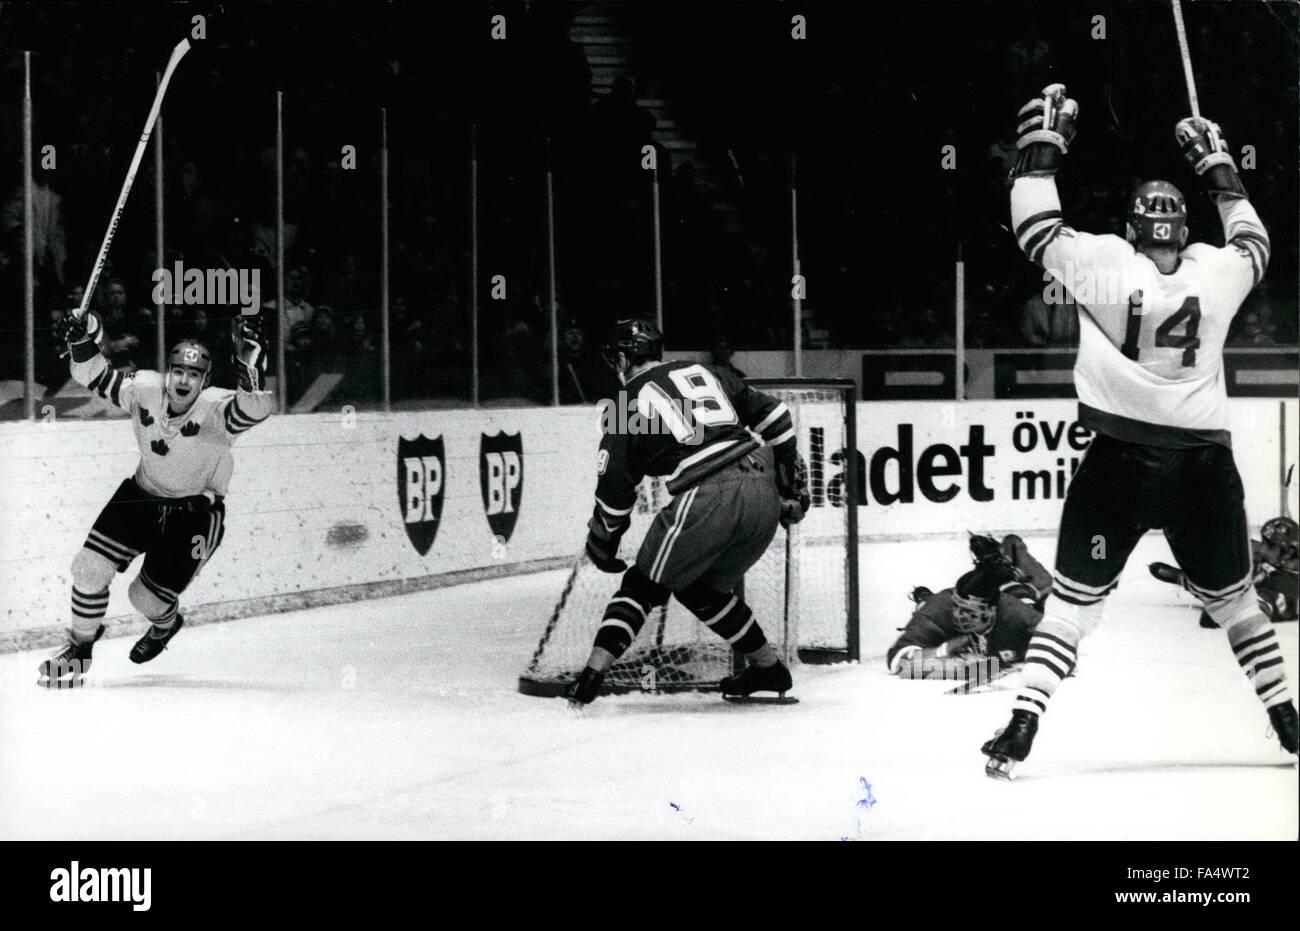 1970 - Ice Hockey World Championship Stockholm 1970, USSR-Sweden 2:2 Nr 12 Stig-Goran Johansson, Sweden, scoring Stock Photo